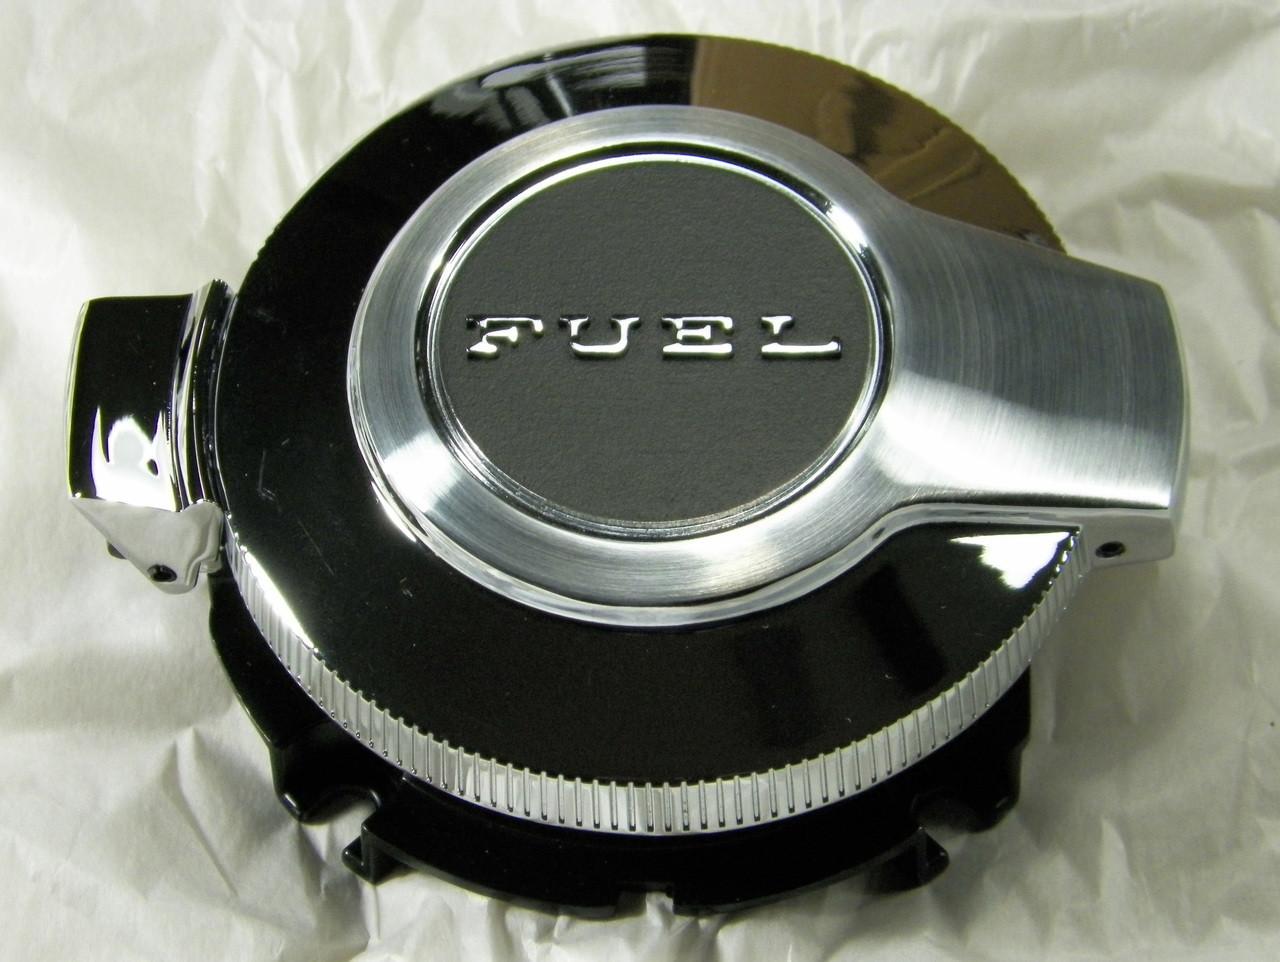 71-74 Cuda Challenger Cowl Grill Screws